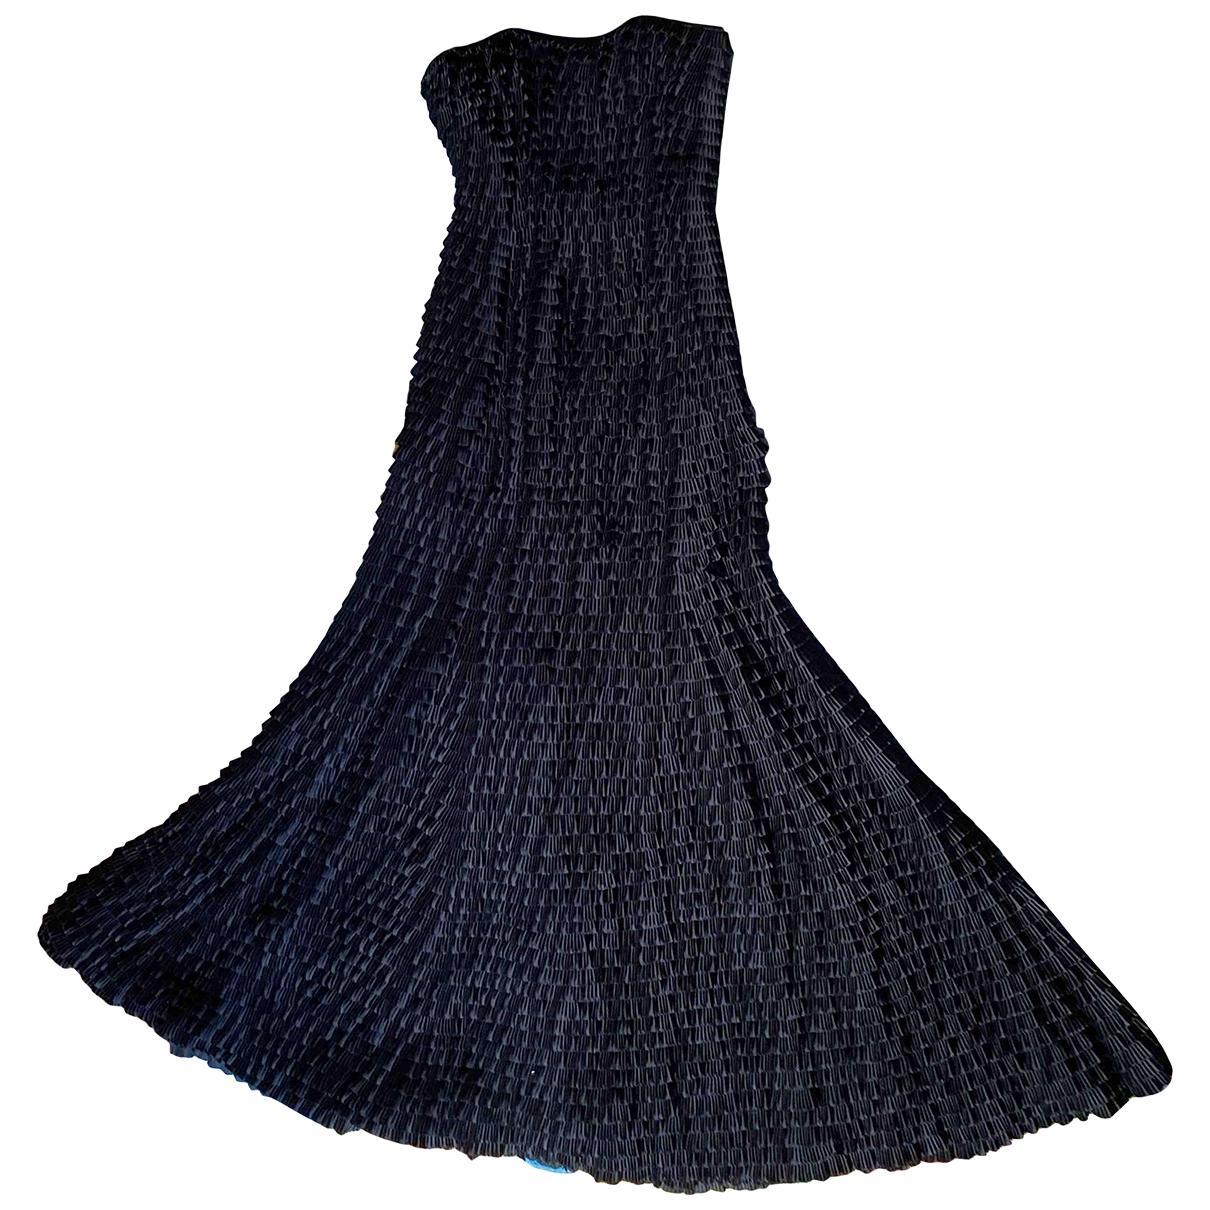 Givenchy \N Black dress for Women 34 FR